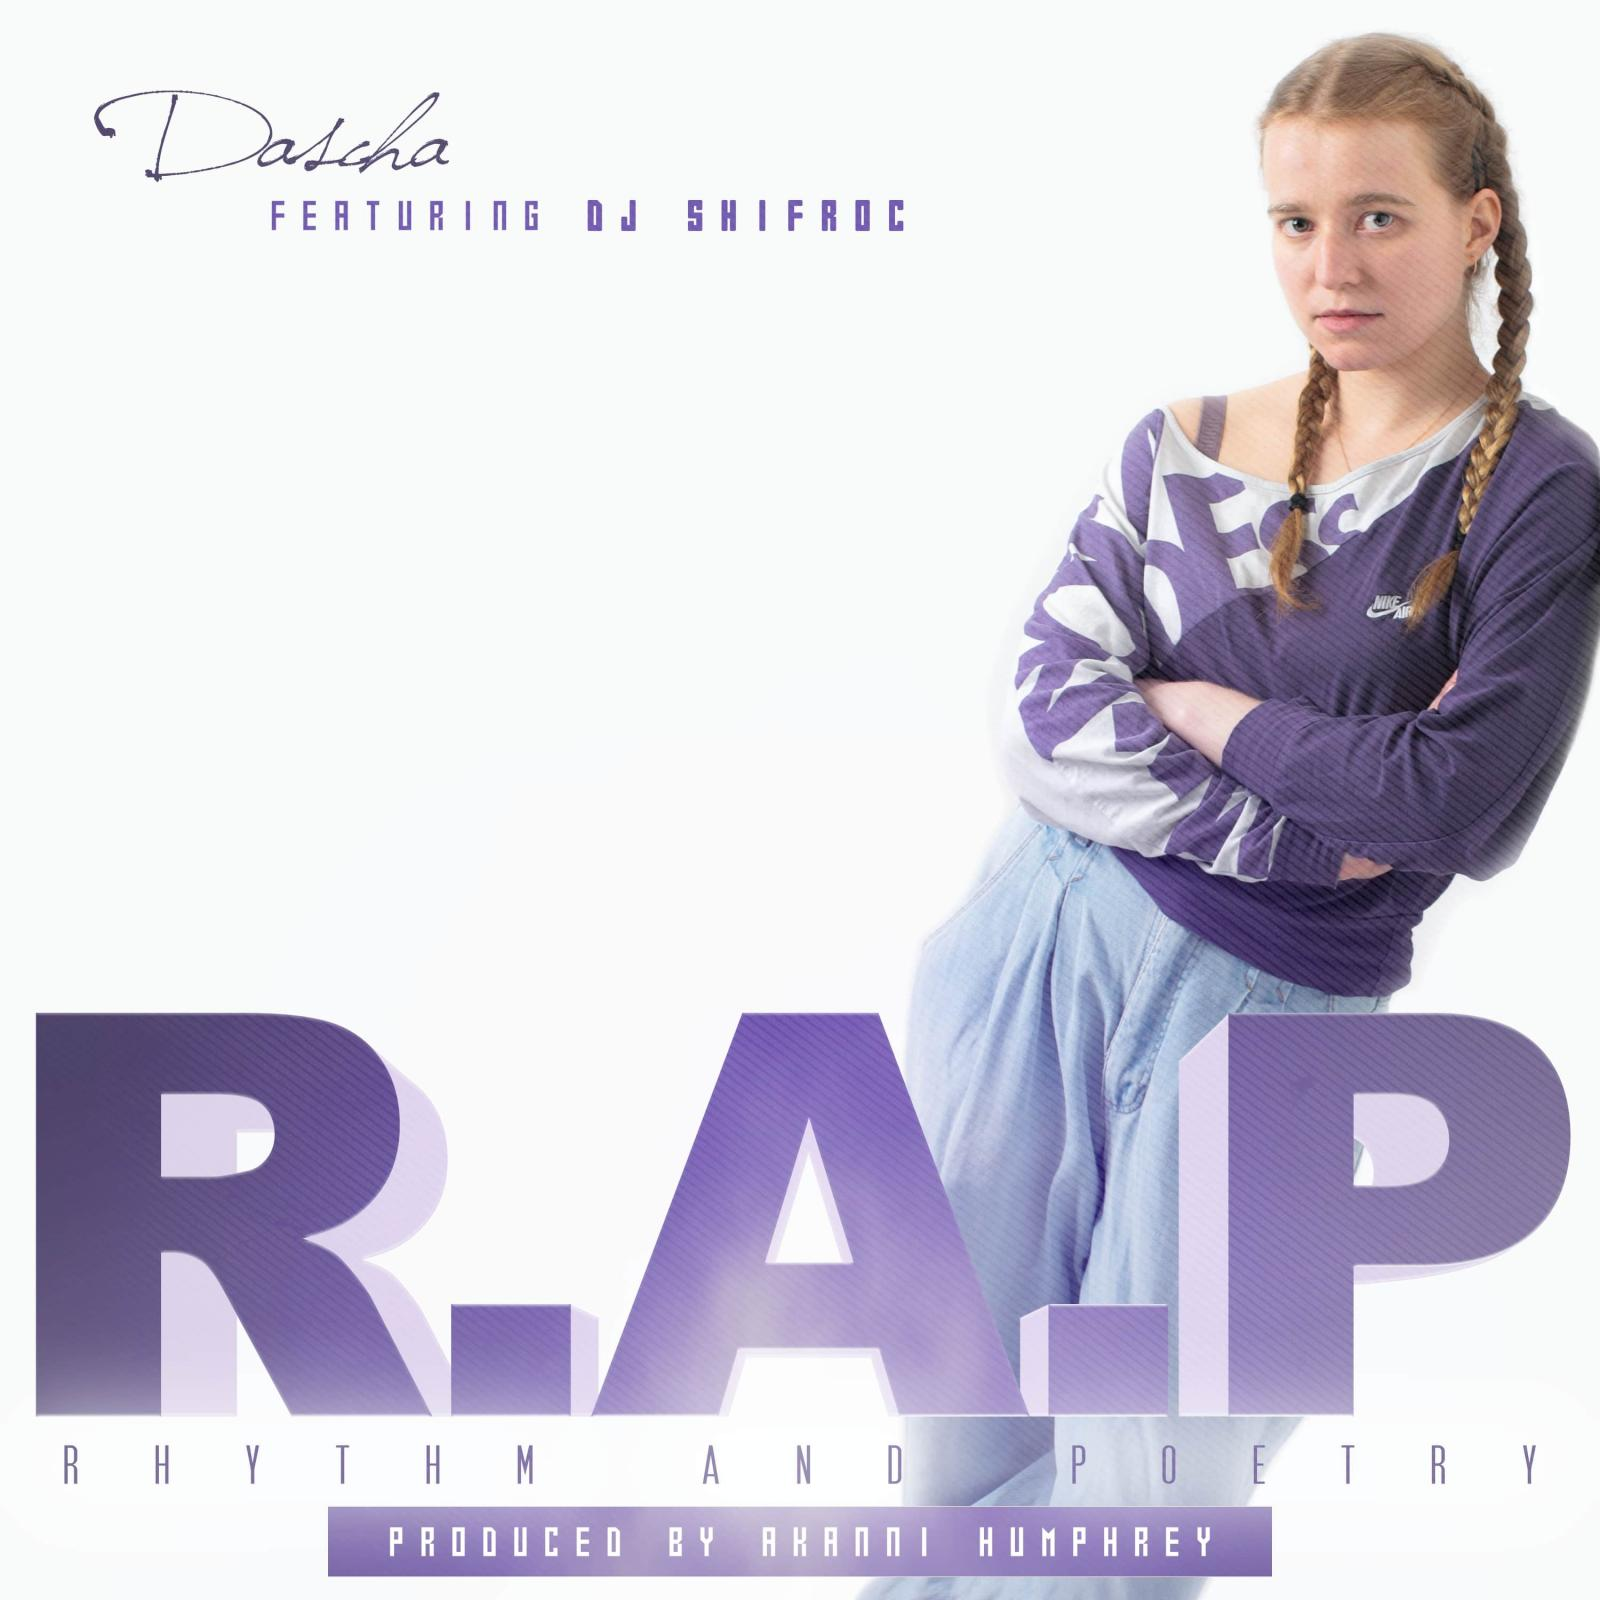 Upcoming: Dascha - R. A. P. Rhythm And Poetry Feat. DJ Shifroc (prod. Akanni Humphrey Aka 1624bapbeatz)